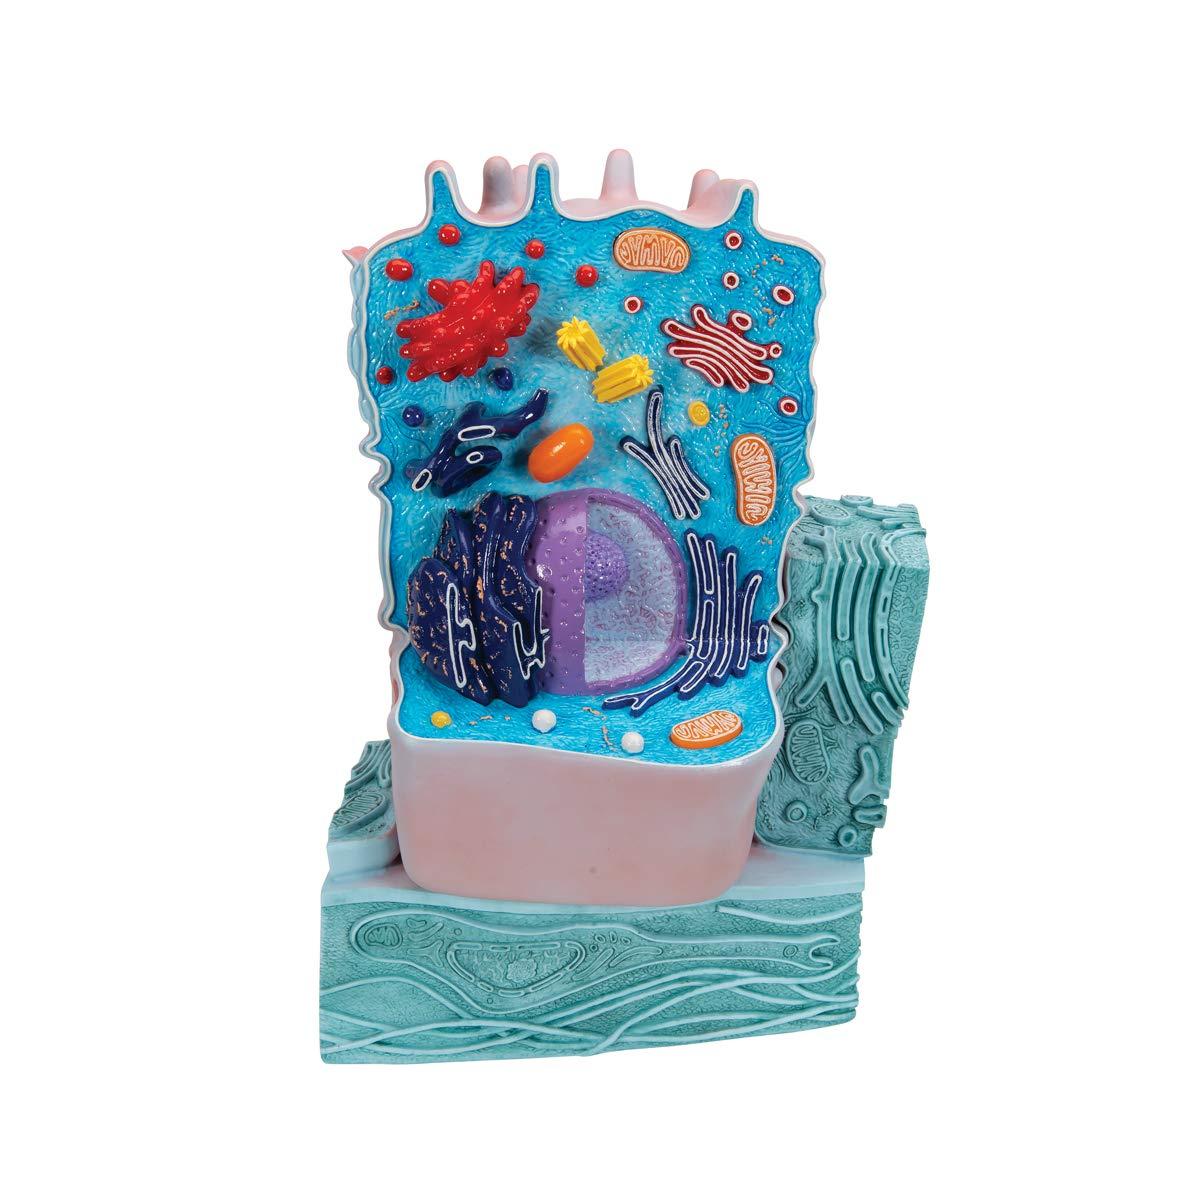 3B Scientific R04 Animal Cell Model, 8.3'' x 4.3'' x 12.2''